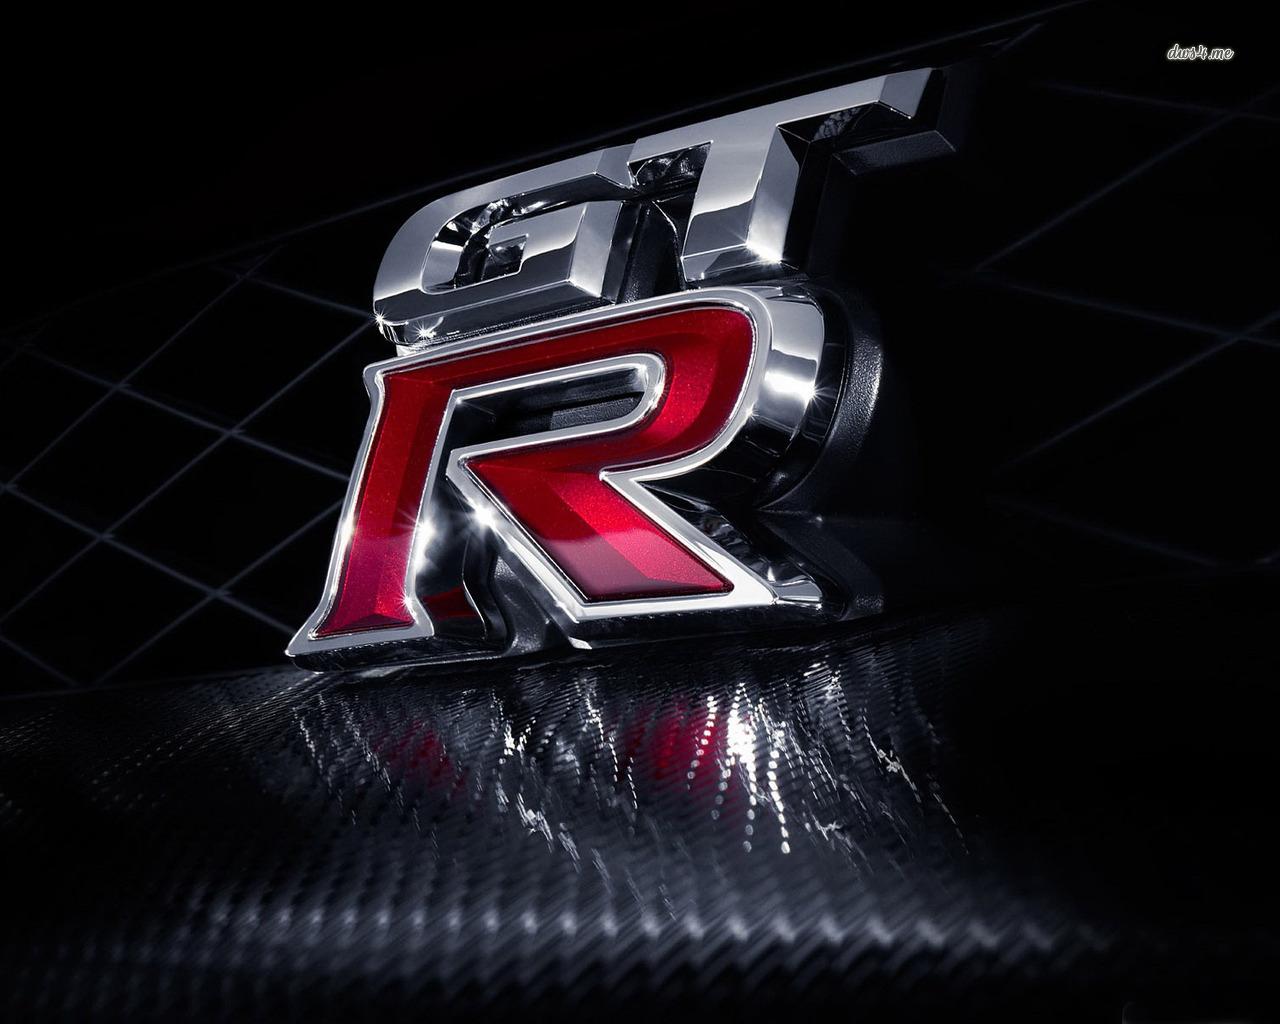 Car Logos Nissan Gt R Logo Wallpaper 6544 Wallpaper WallpapersTube 1280x1024